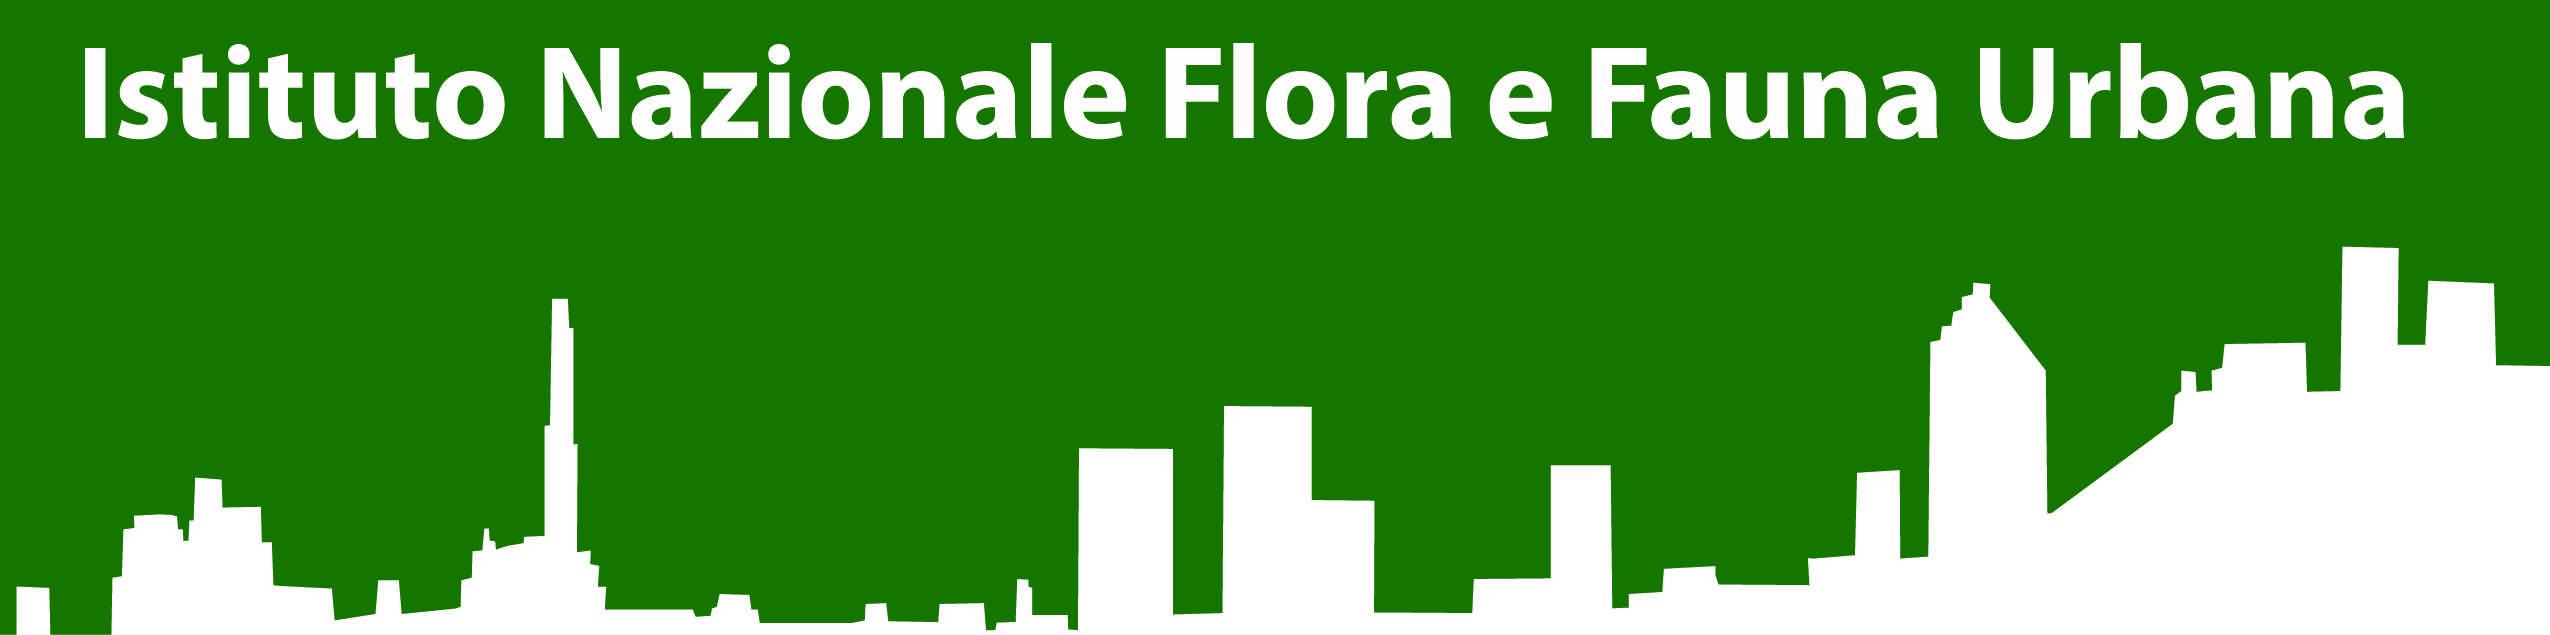 Istituto Nazionale Flora e Fauna Urbana